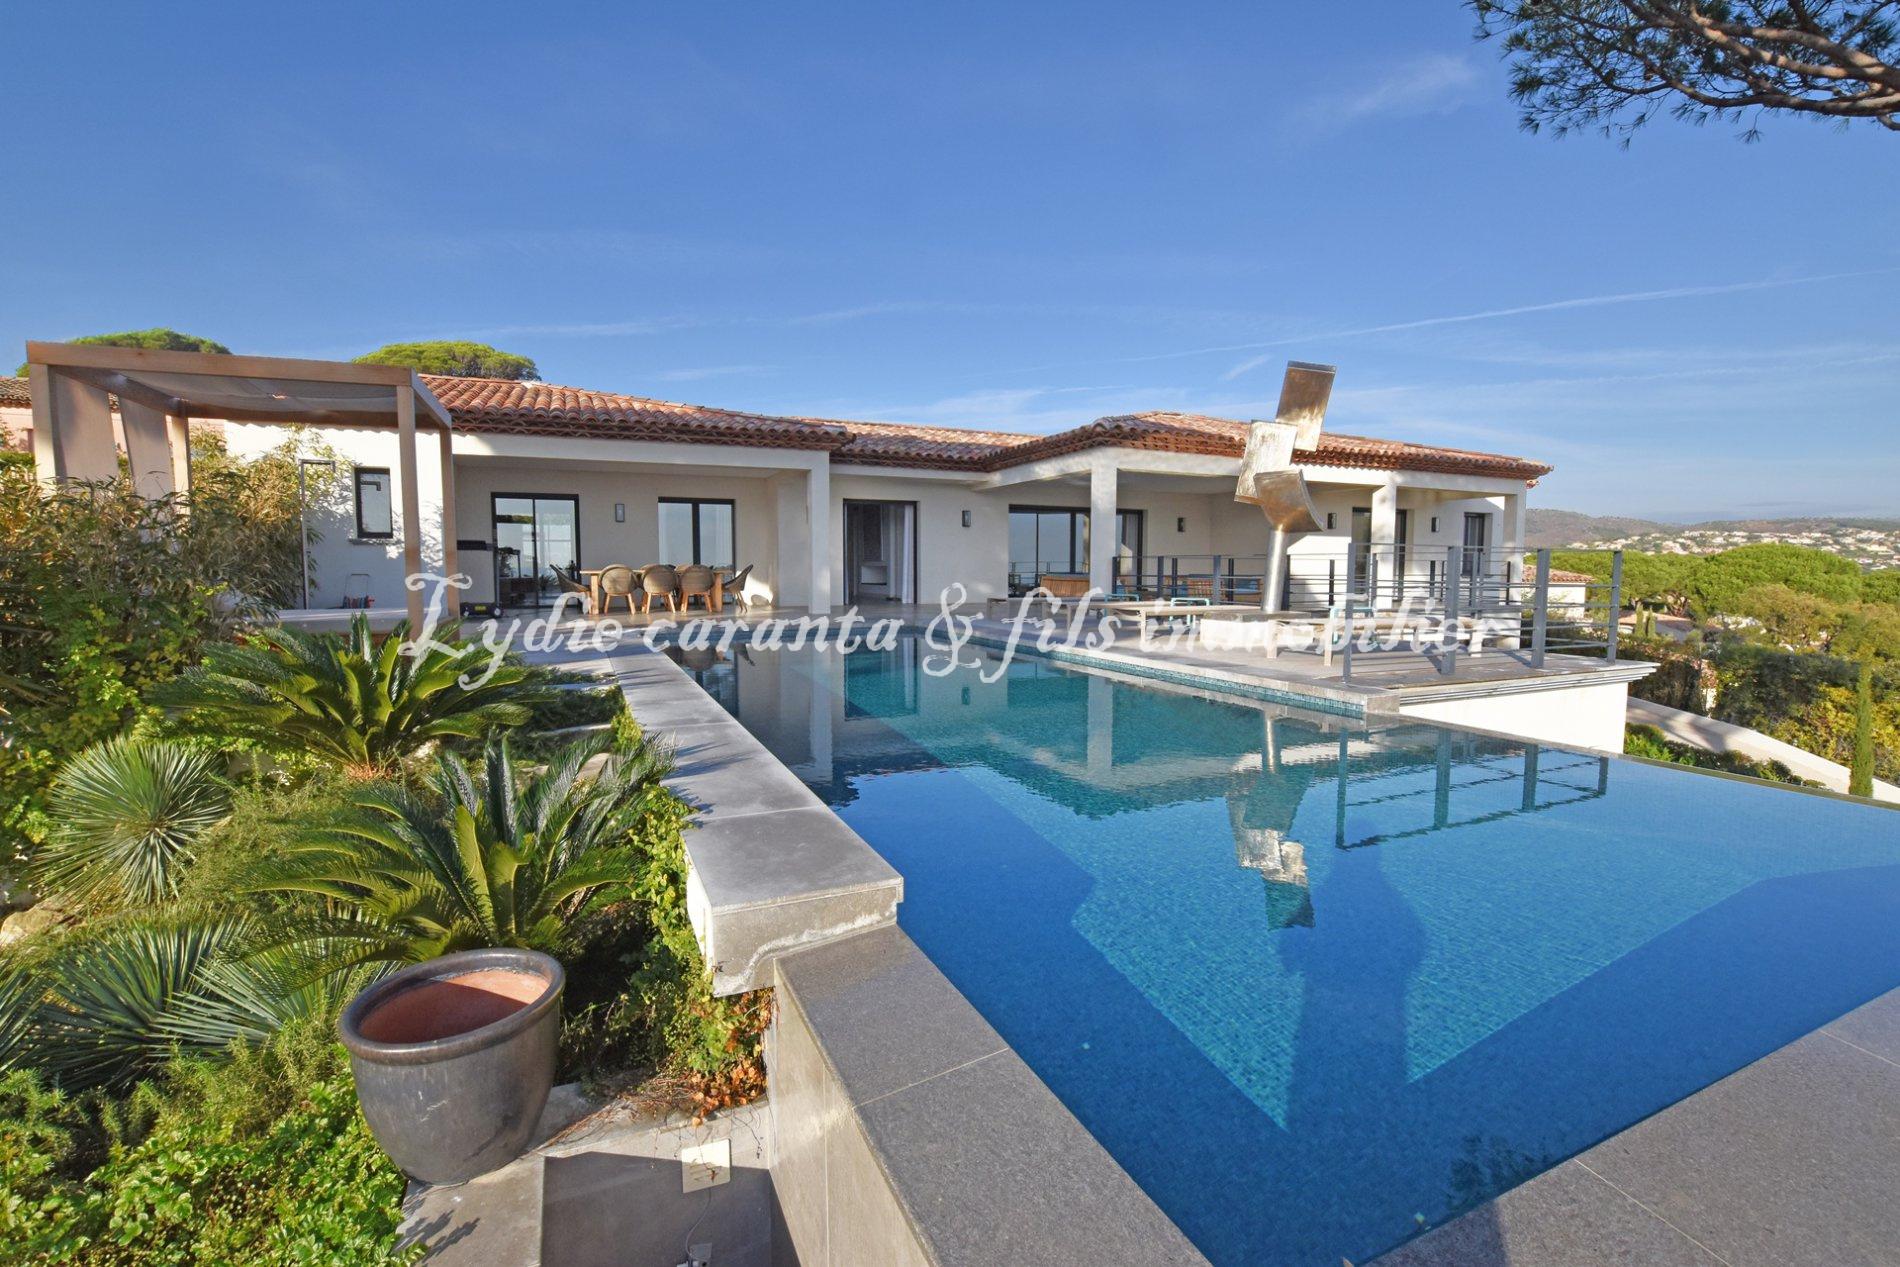 Vente Villa Prestige Vue Mer Sainte-Maxime avec piscine et prestations de  luxe